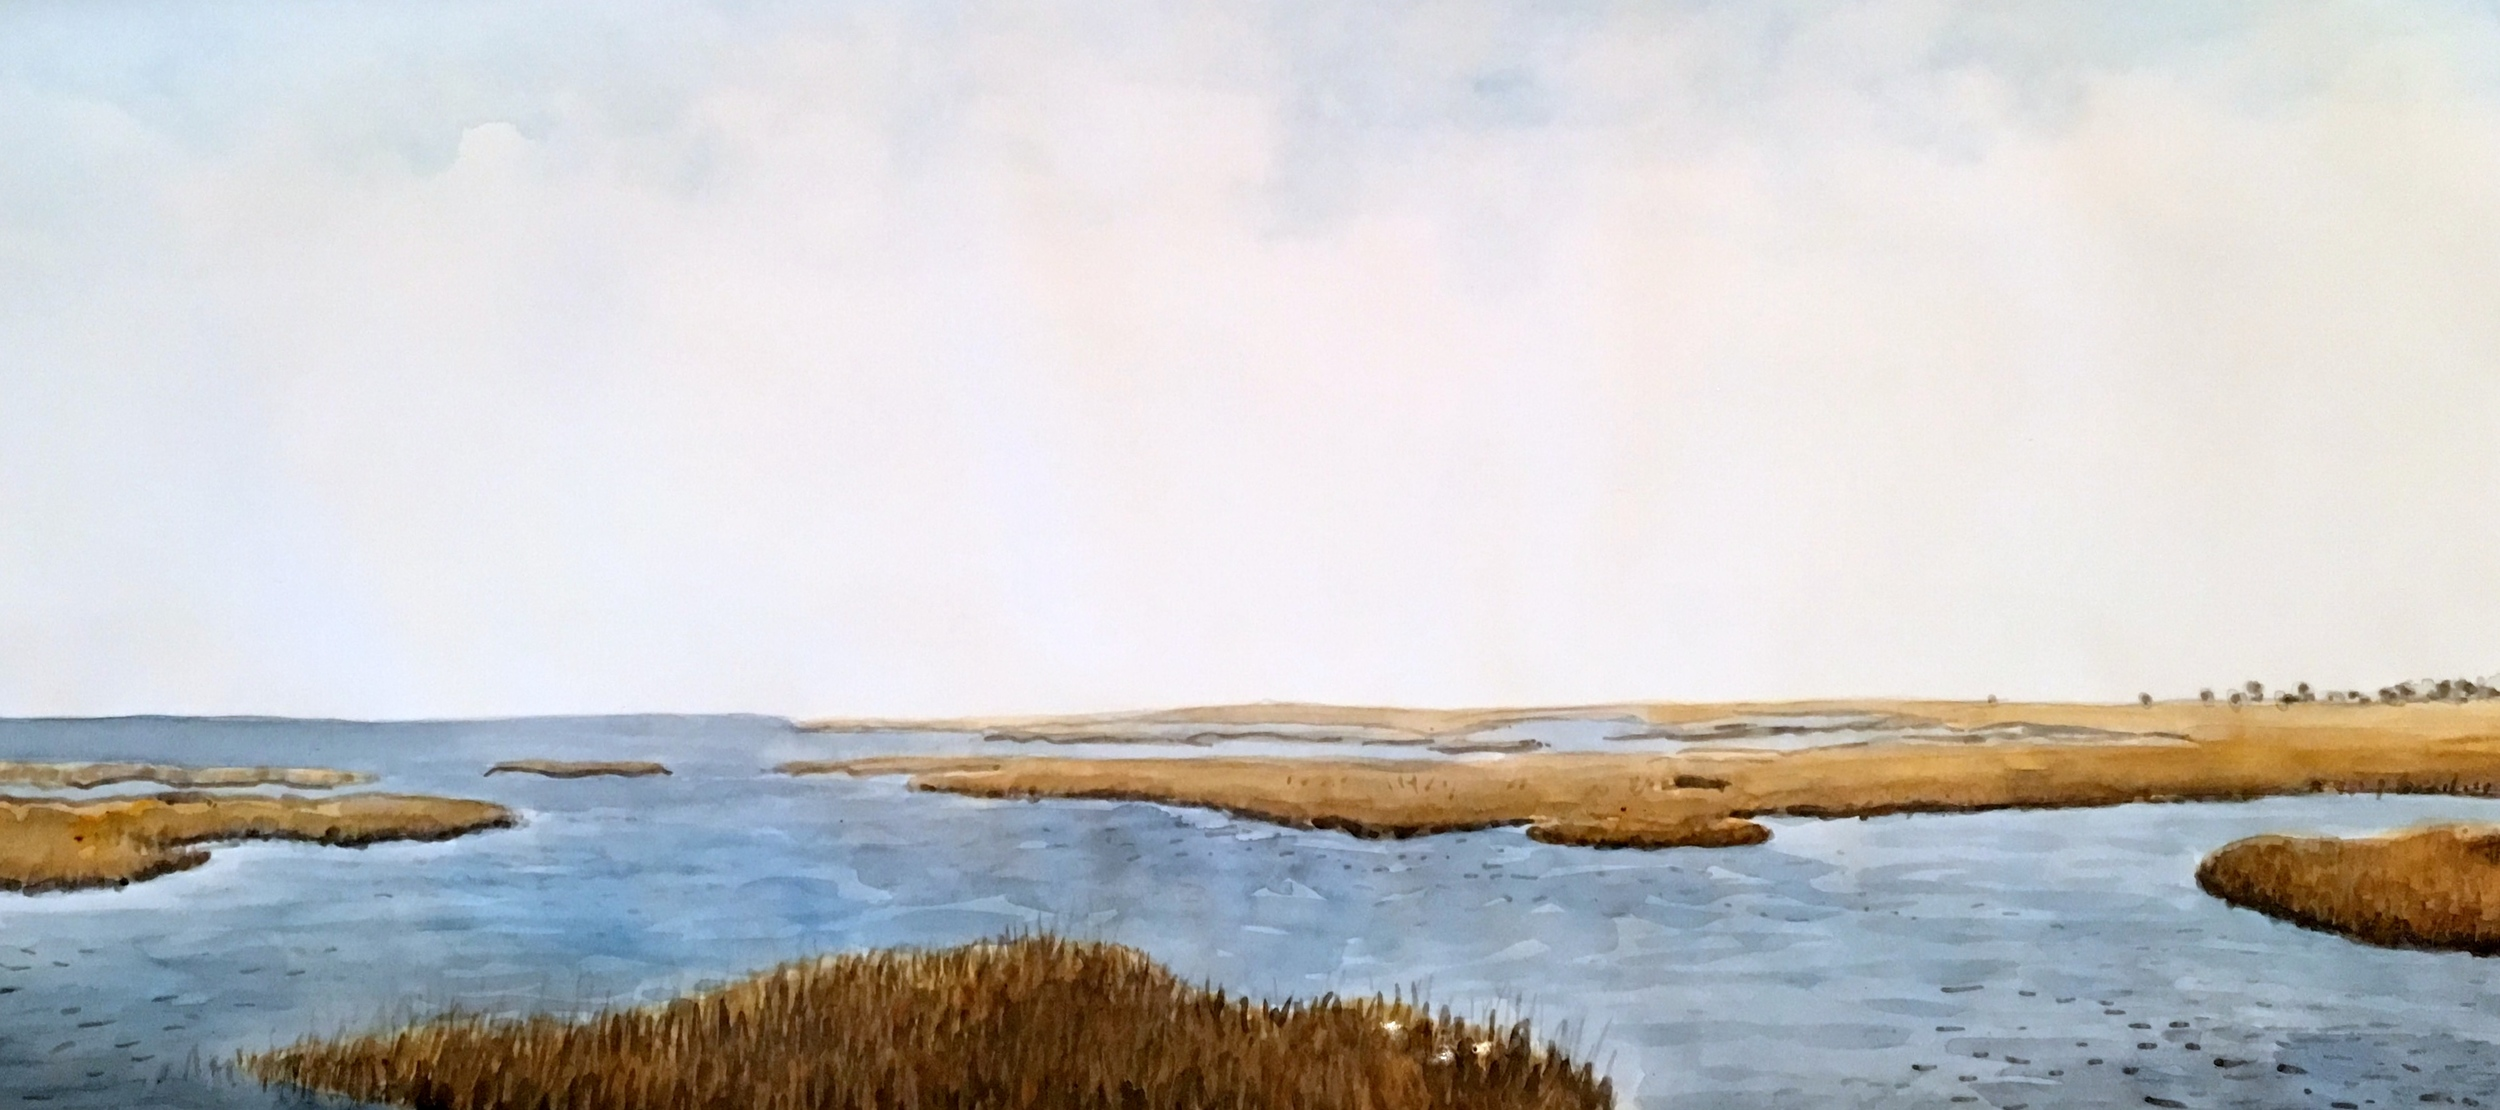 Peaceful Estuary